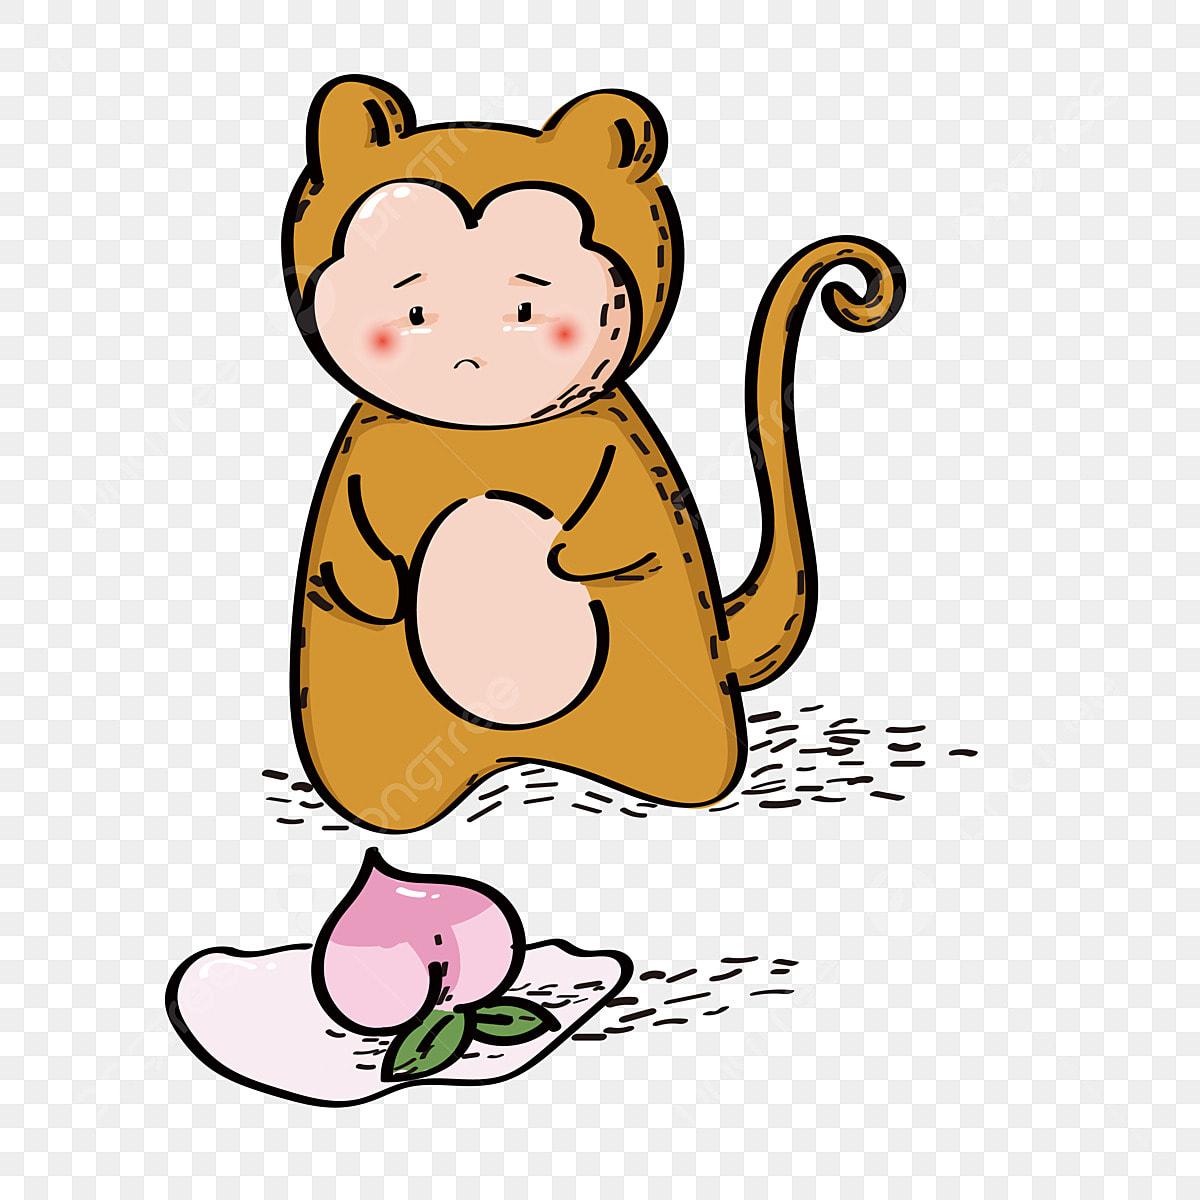 Animal Monkey Cartoon Commercial Element Animal Little